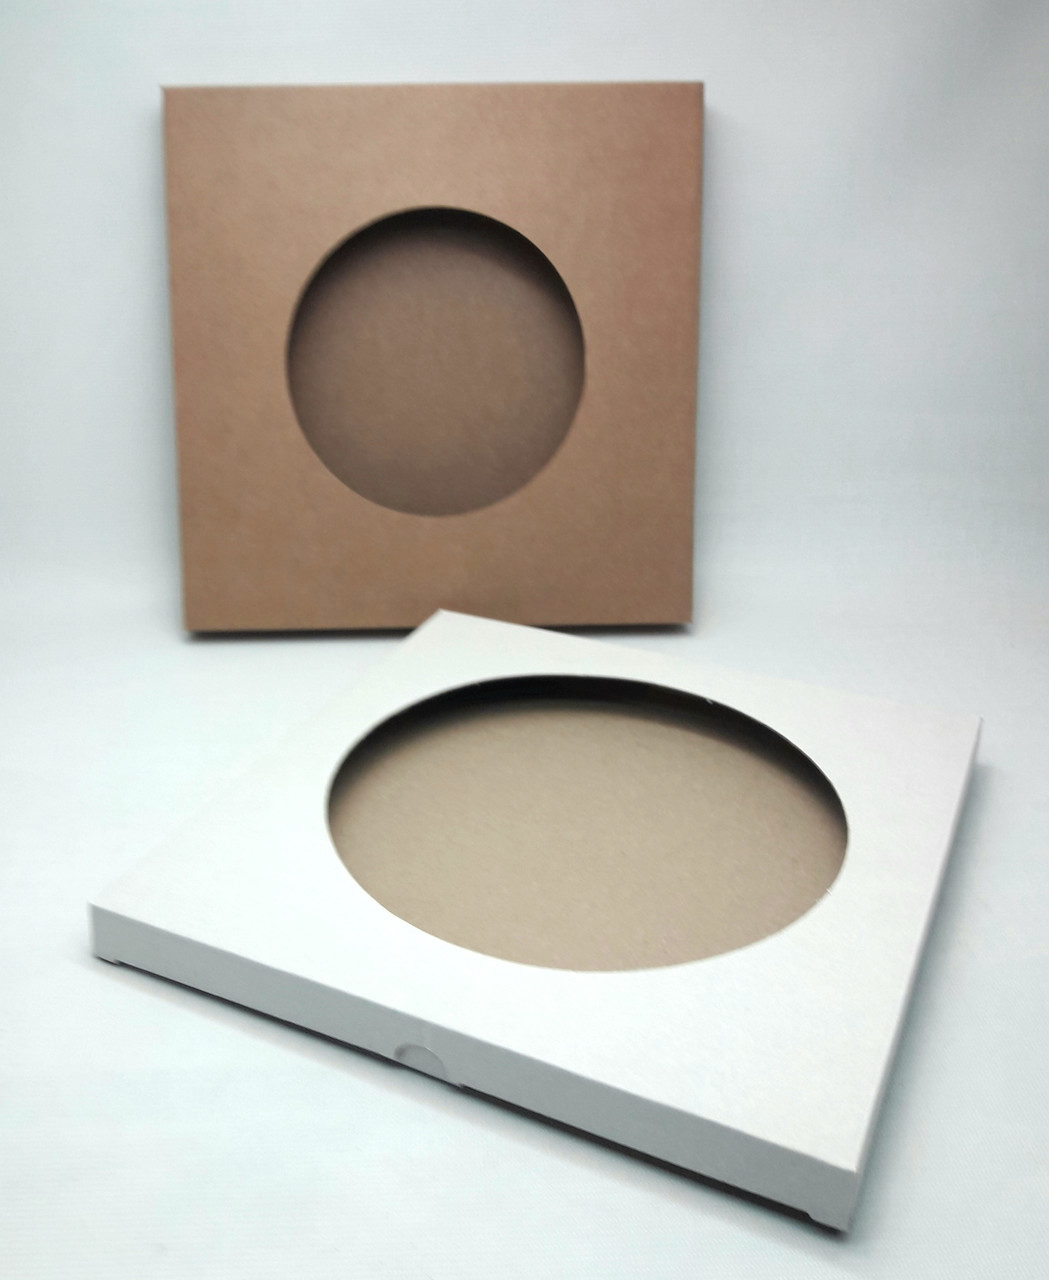 УПАКОВКА под тарелку,  250Х20Х250 (диаметр окошка 210 мм. )